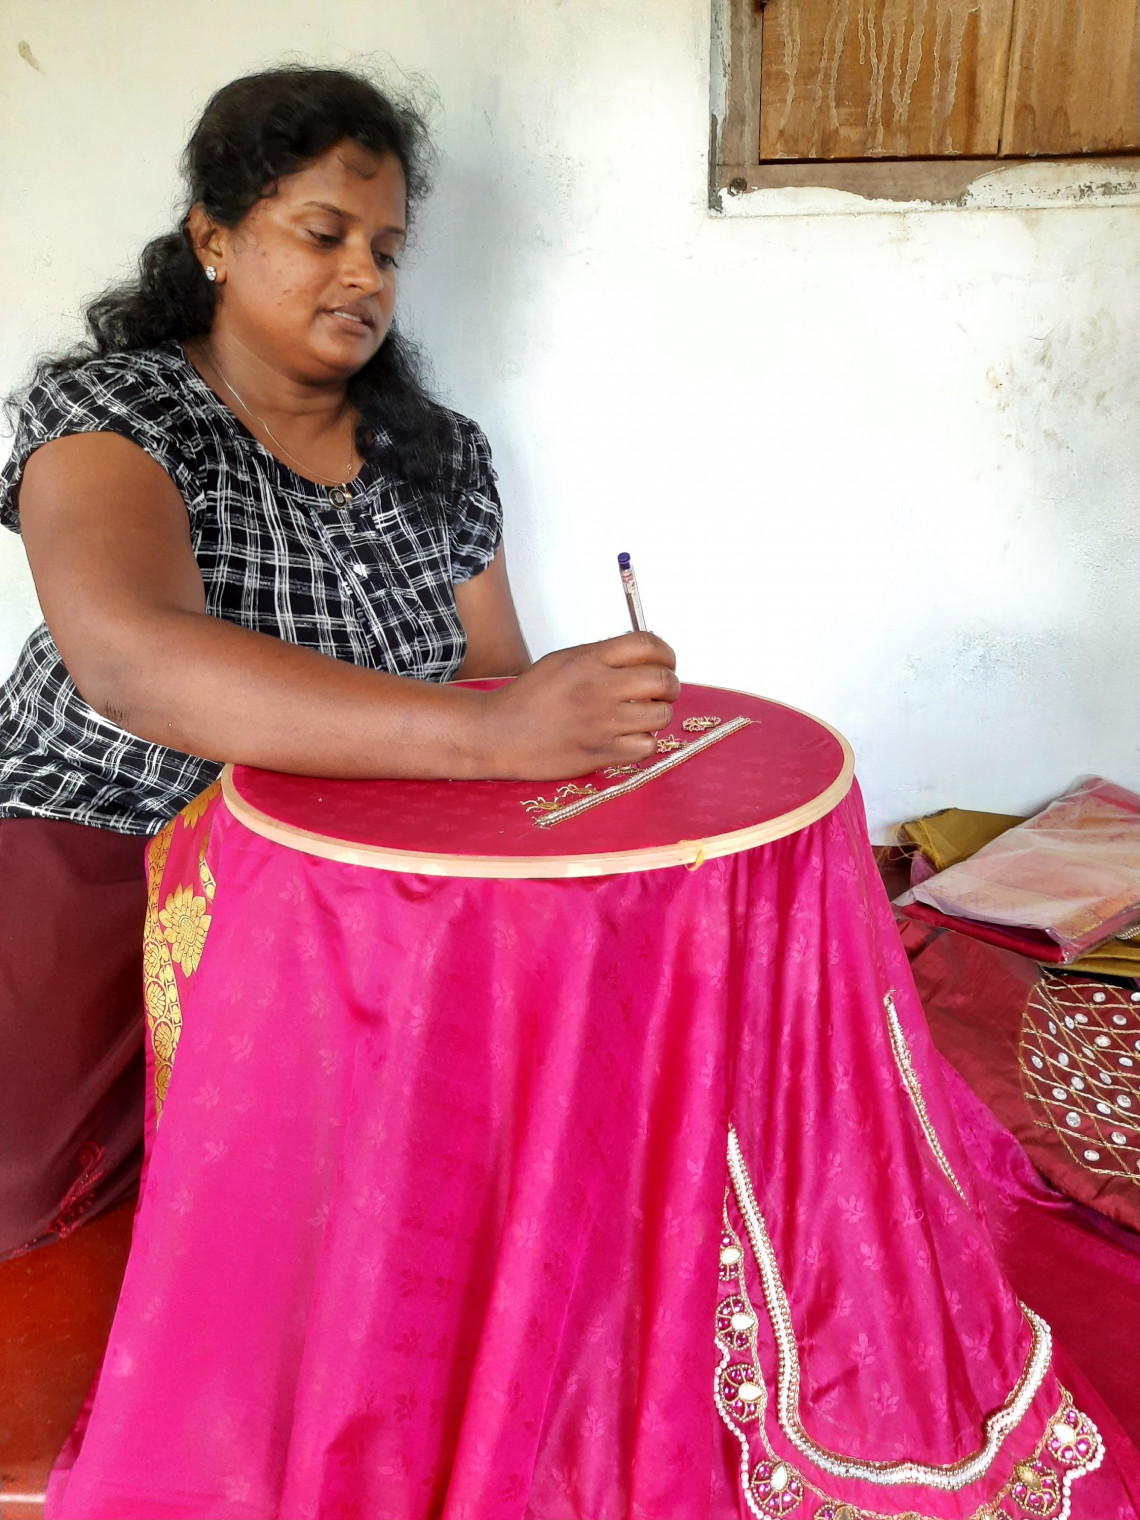 Sri Lanka: Taking on life with needle and thread